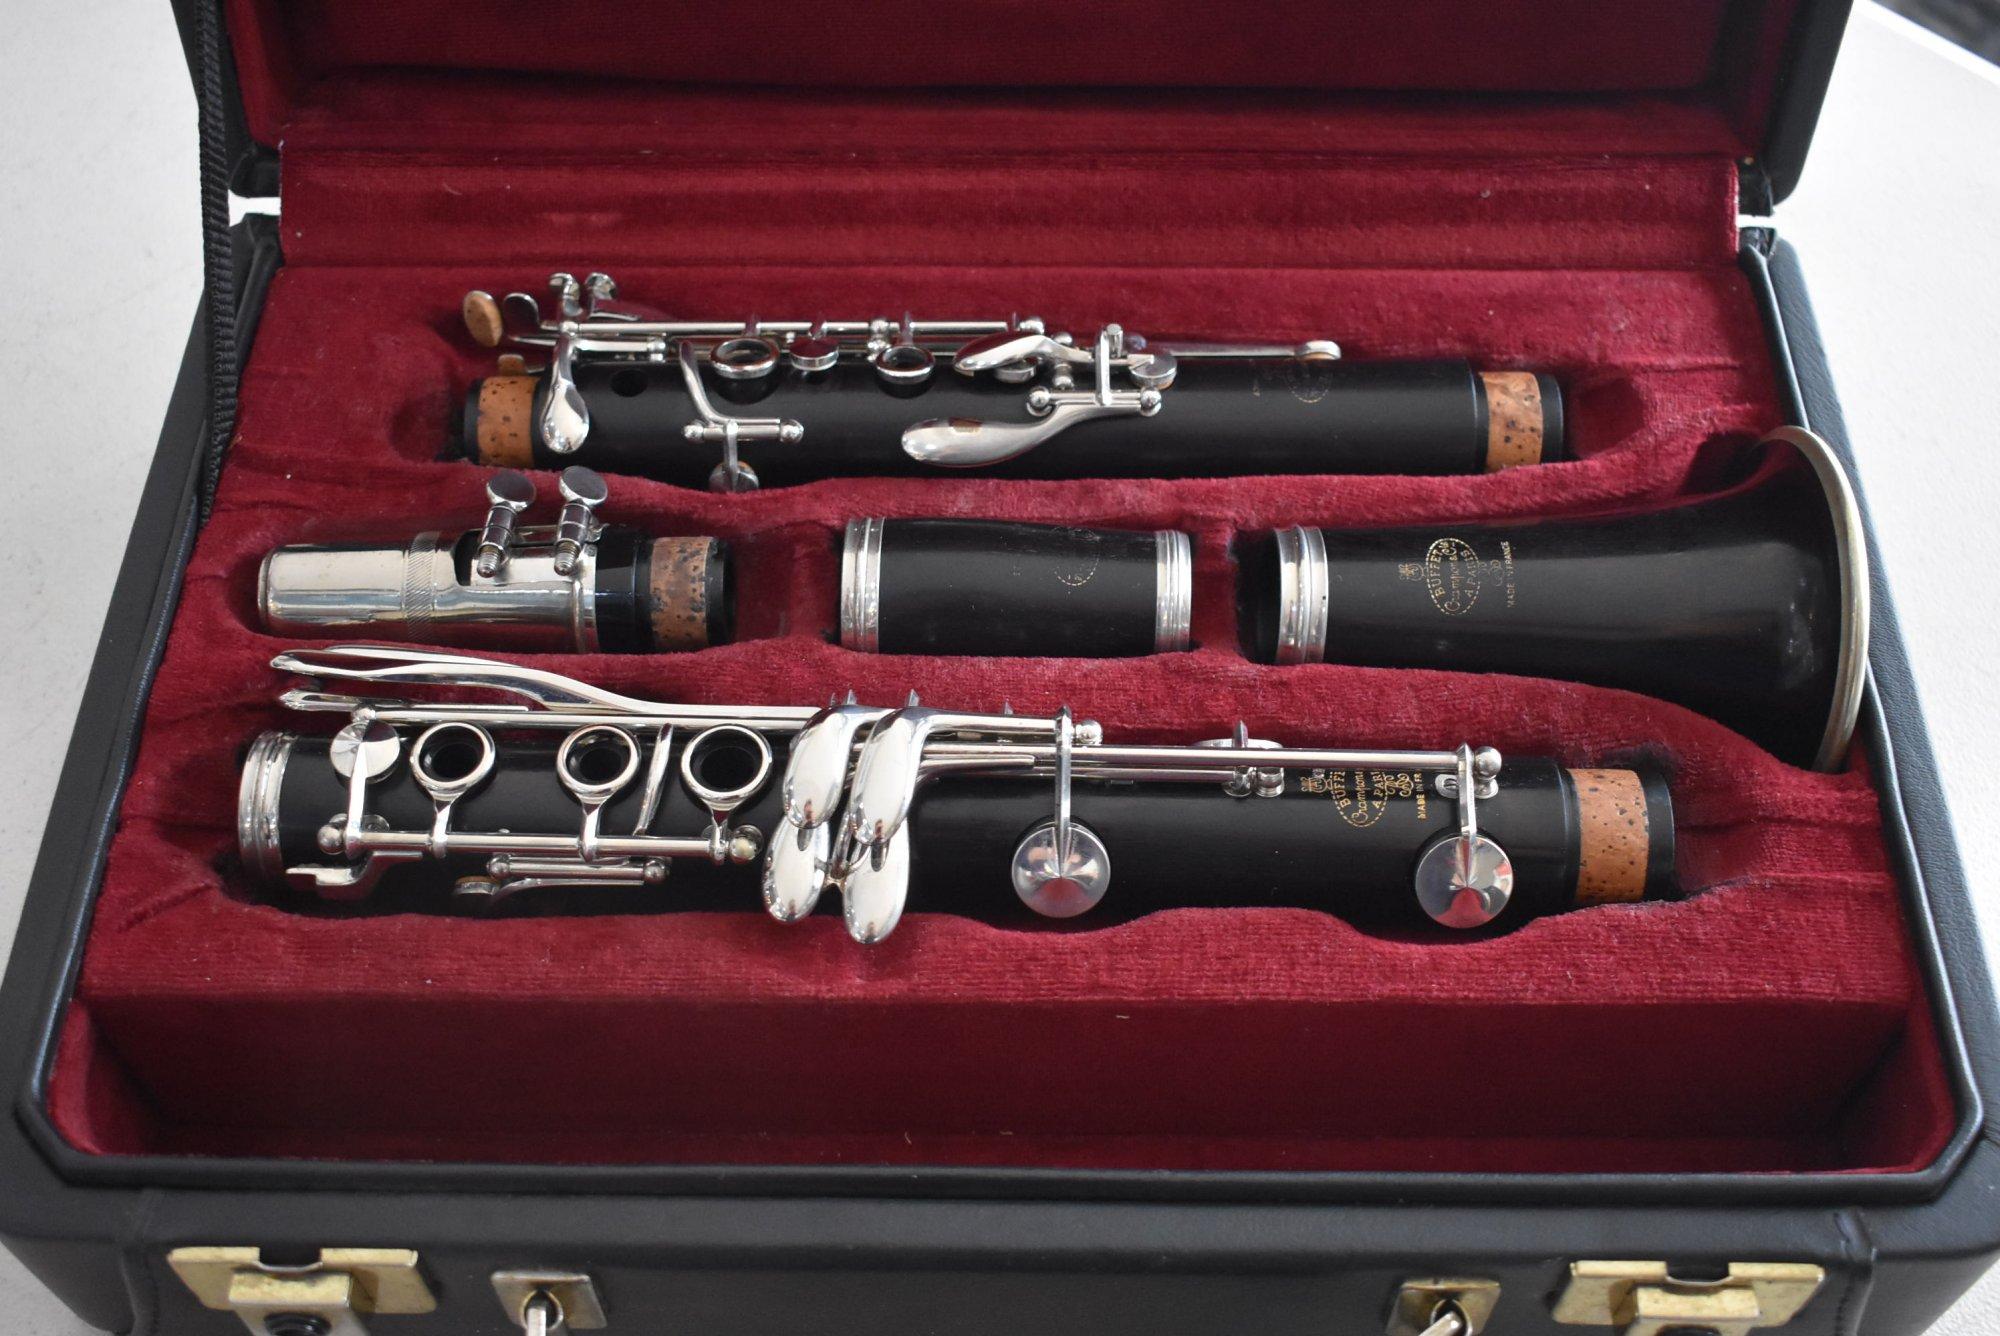 Used Buffet R-13 Clarinet